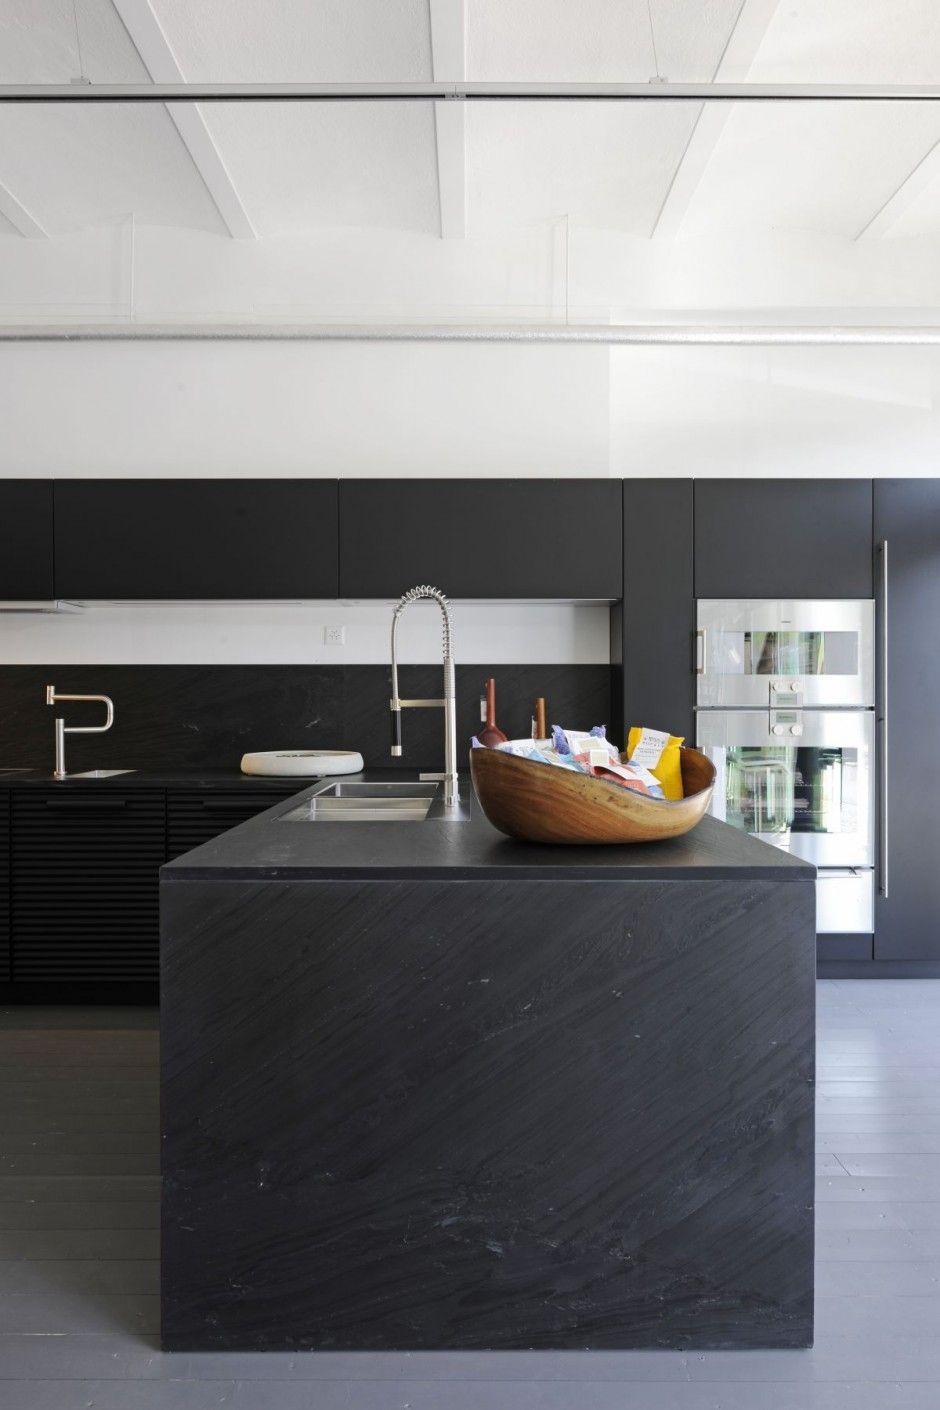 Captivating Schiffini Opens New Kitchen Showroom In Zurich 3